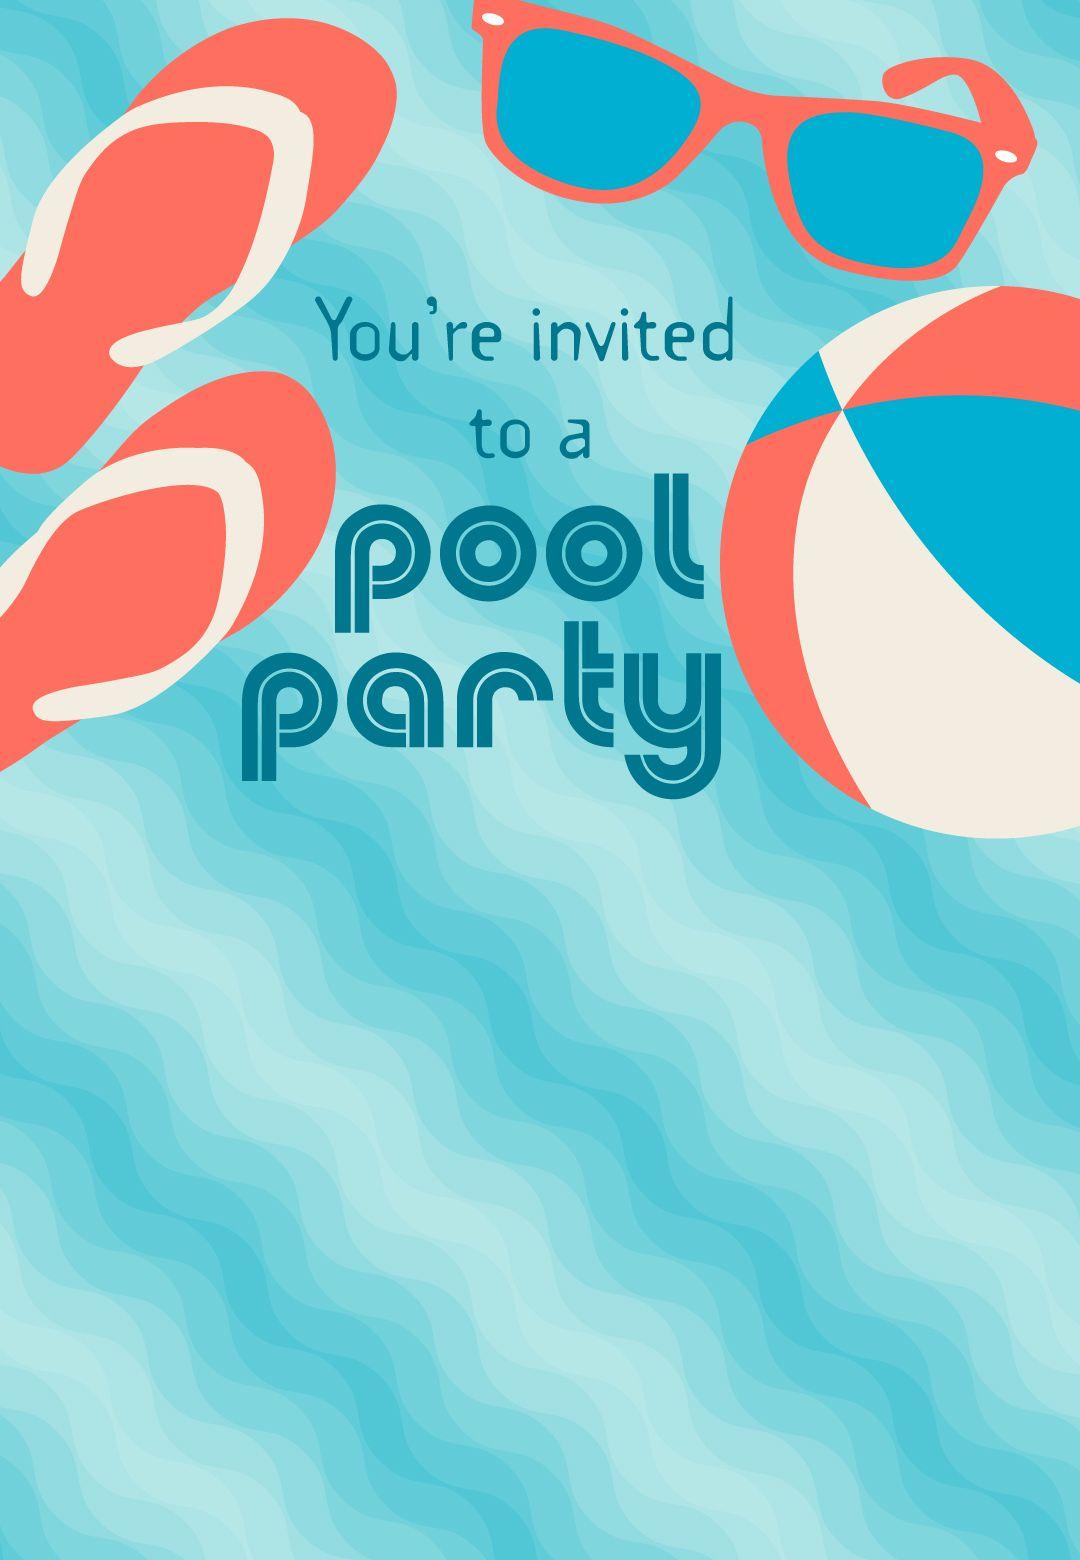 Pool Party #invitation - Free #printable #summer #party | Fun In The - Pool Party Flyers Free Printable